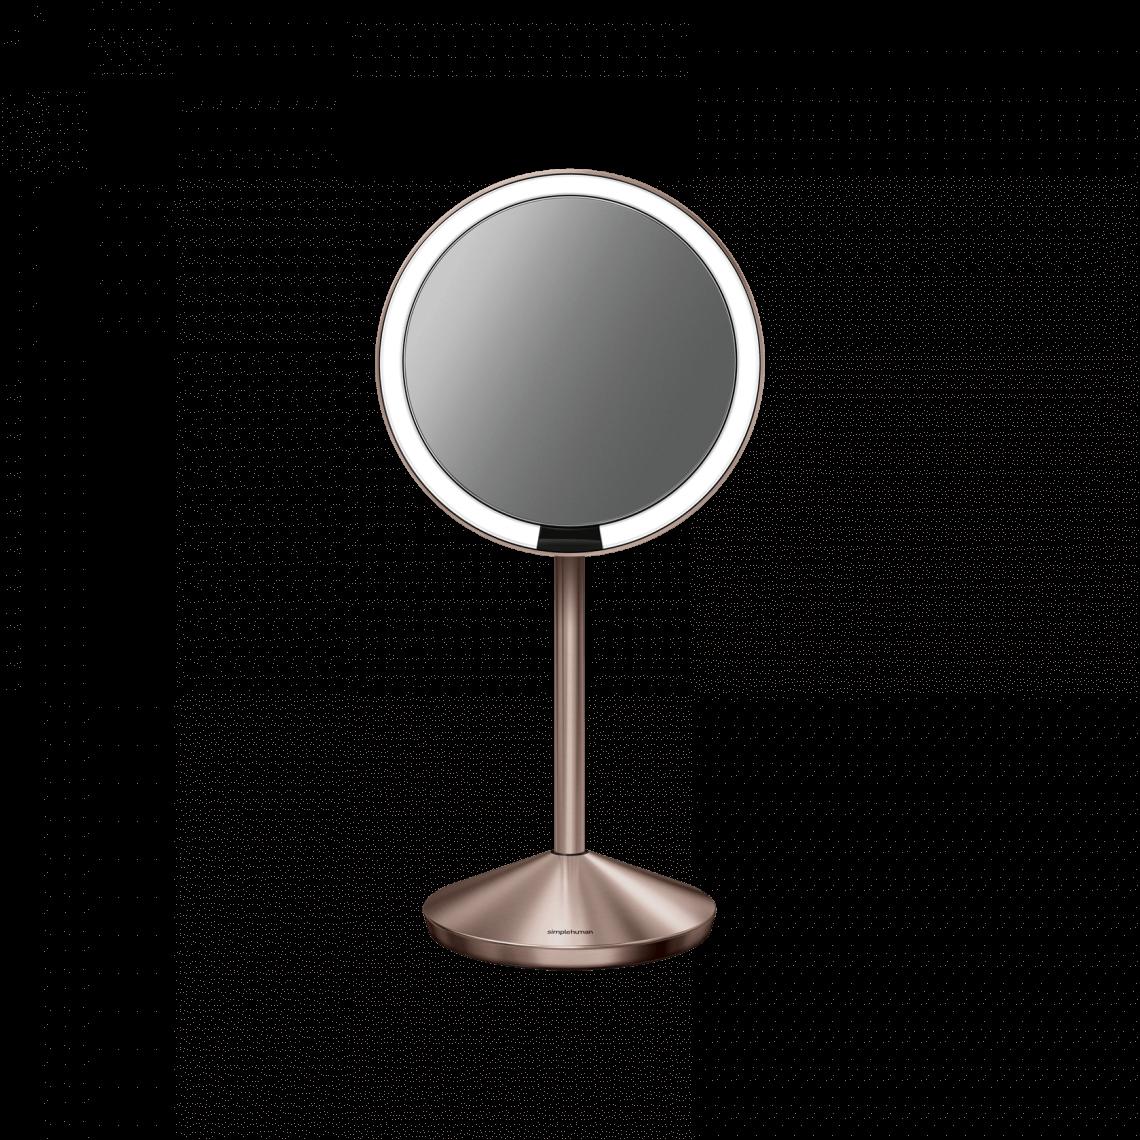 Sensor Mirror Mini 5 Round 10x Magnification Stainless Steel